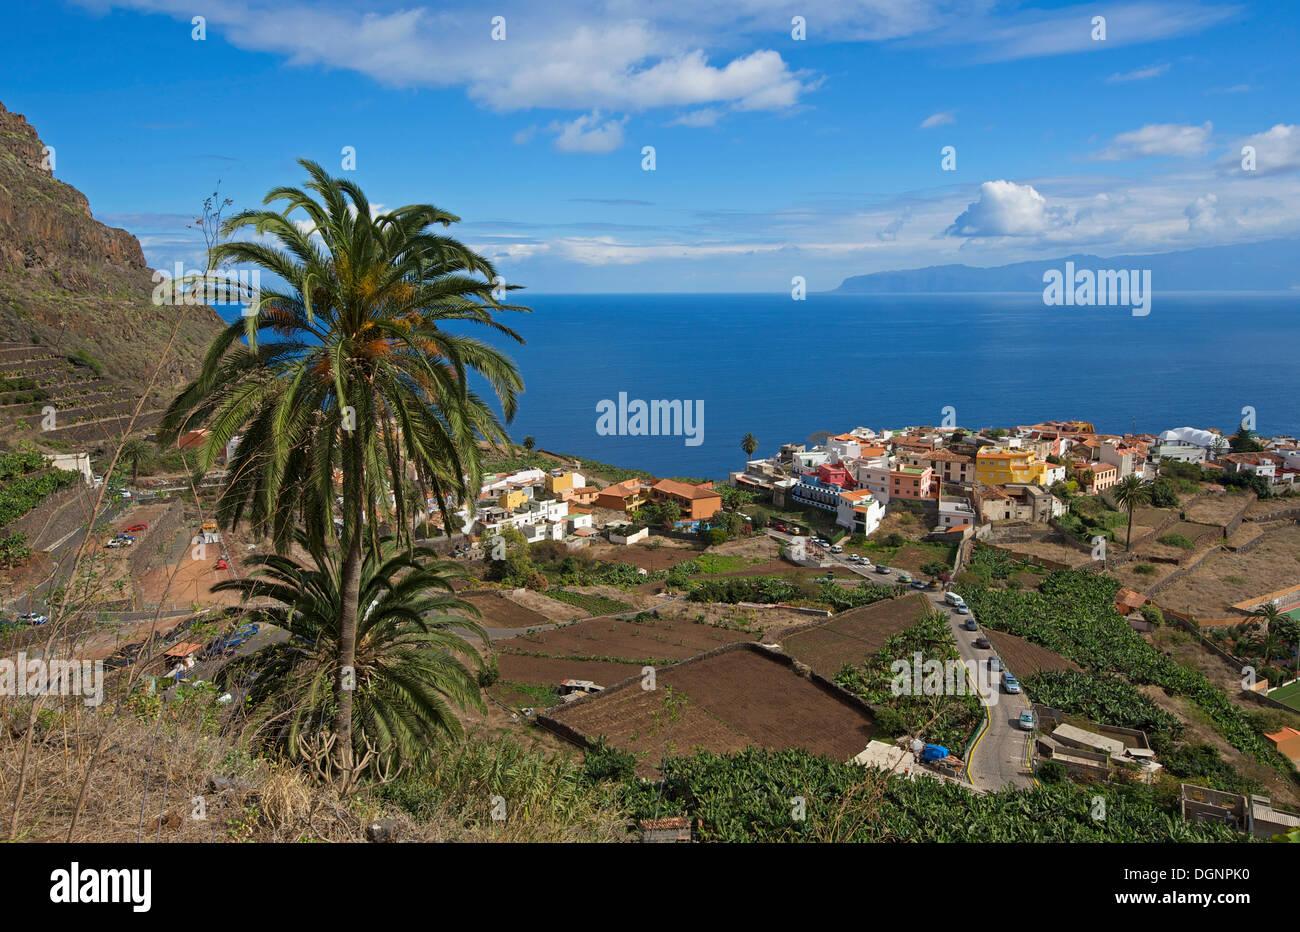 Townscape, Agulo, La Gomera, Canary Islands, Spain - Stock Image